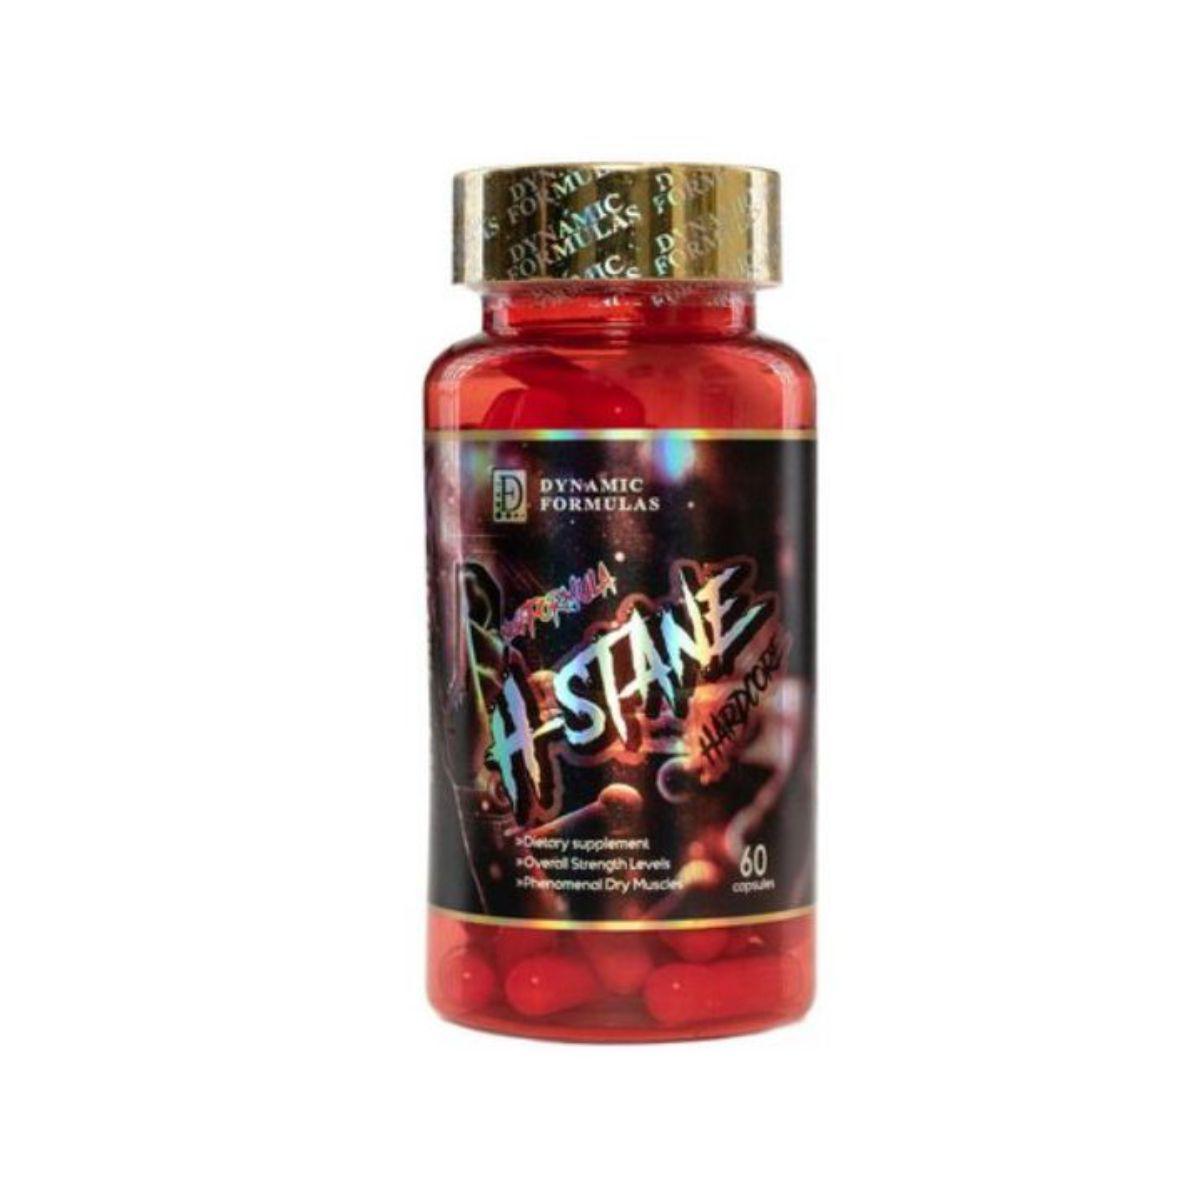 Pró-Hormonal H-Stane Hardcore 60 caps - Dynamic Formulas